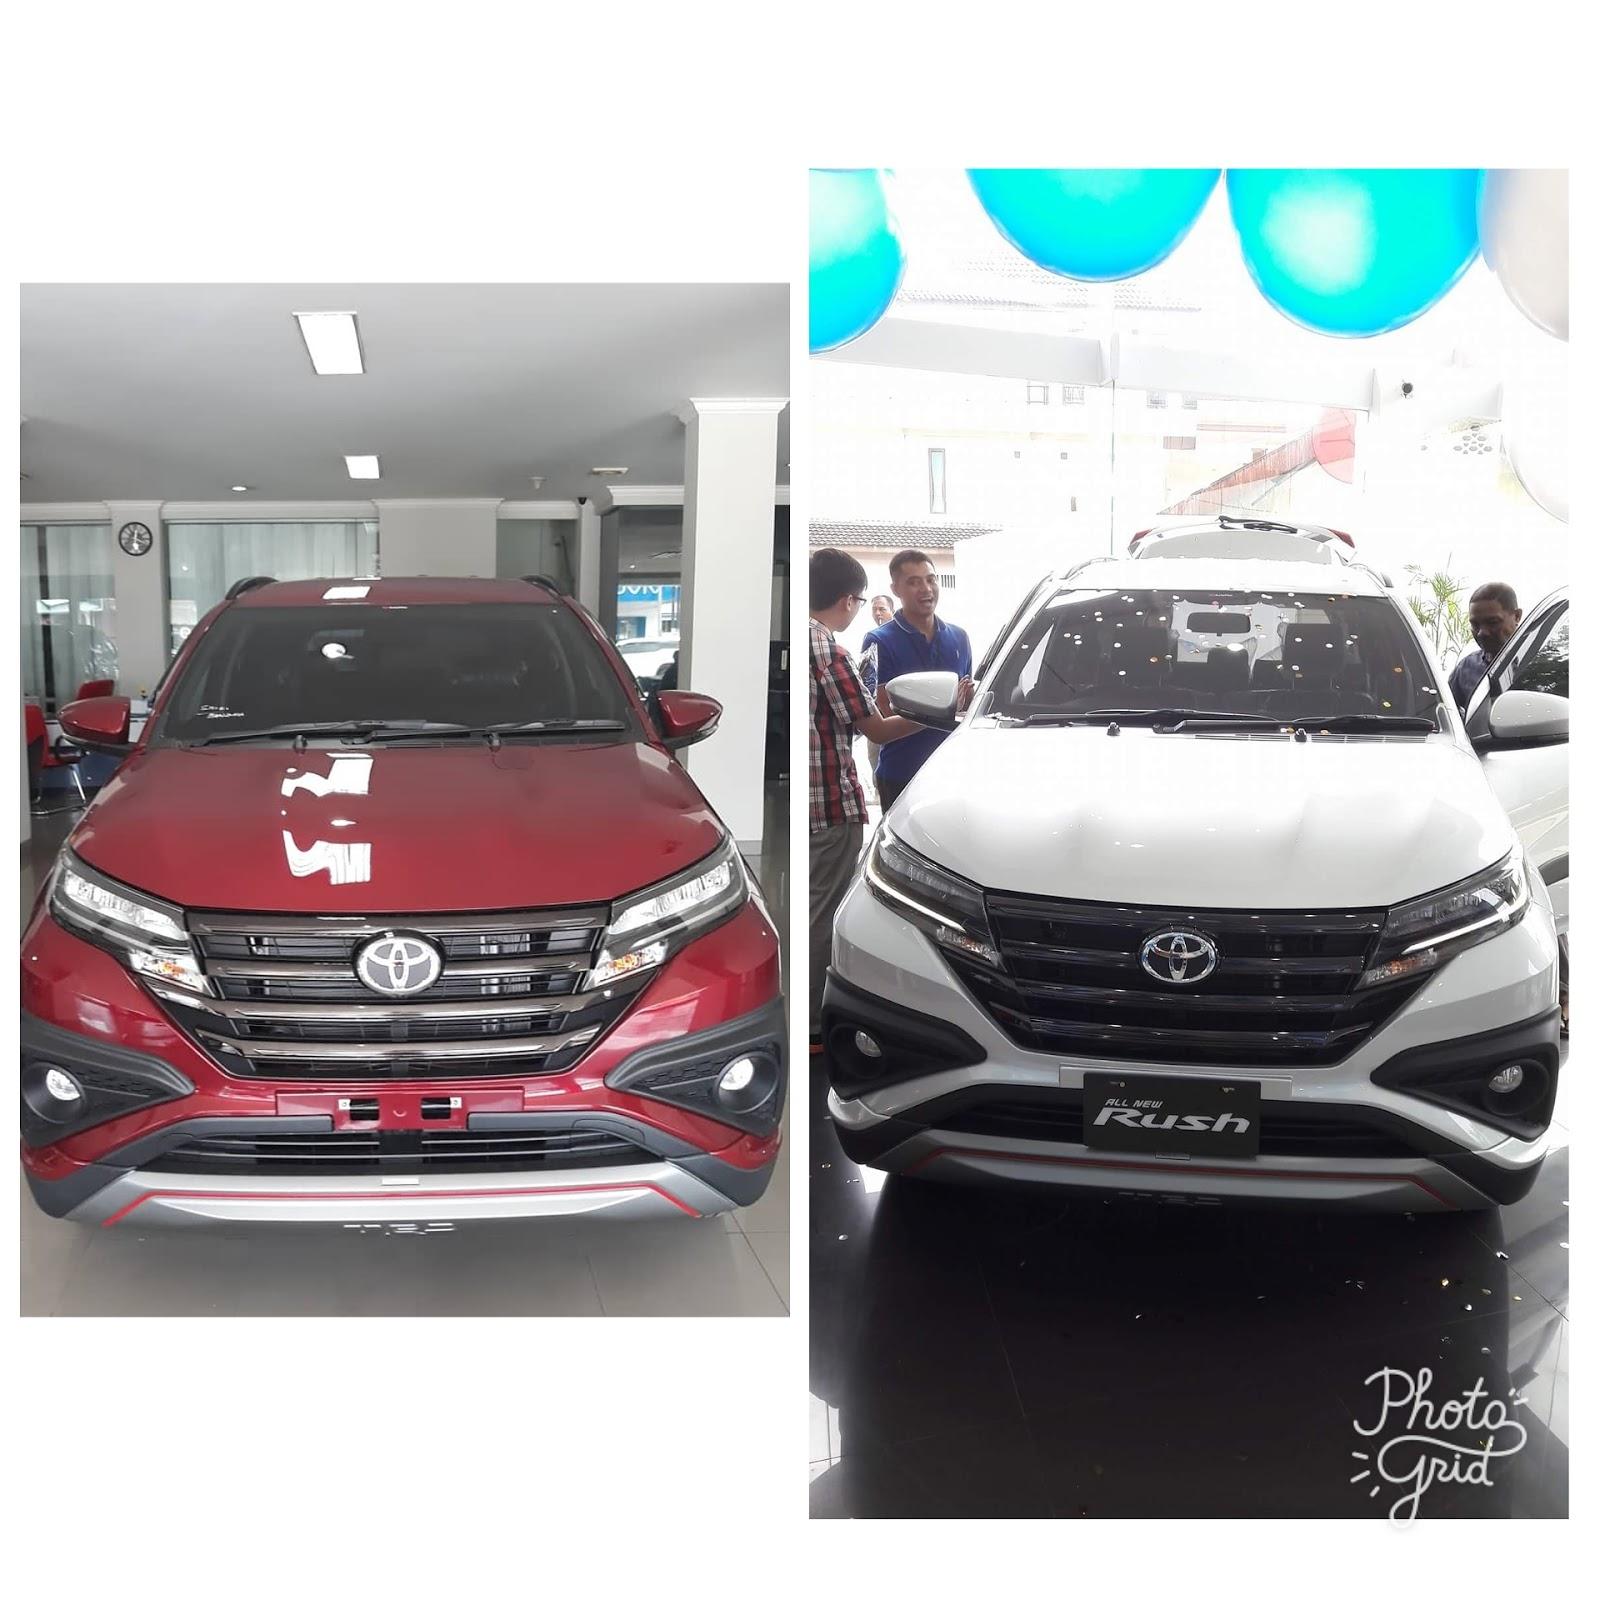 Harga All New Rush 2018 Pangkalpinang Bangka Toyota Bangka